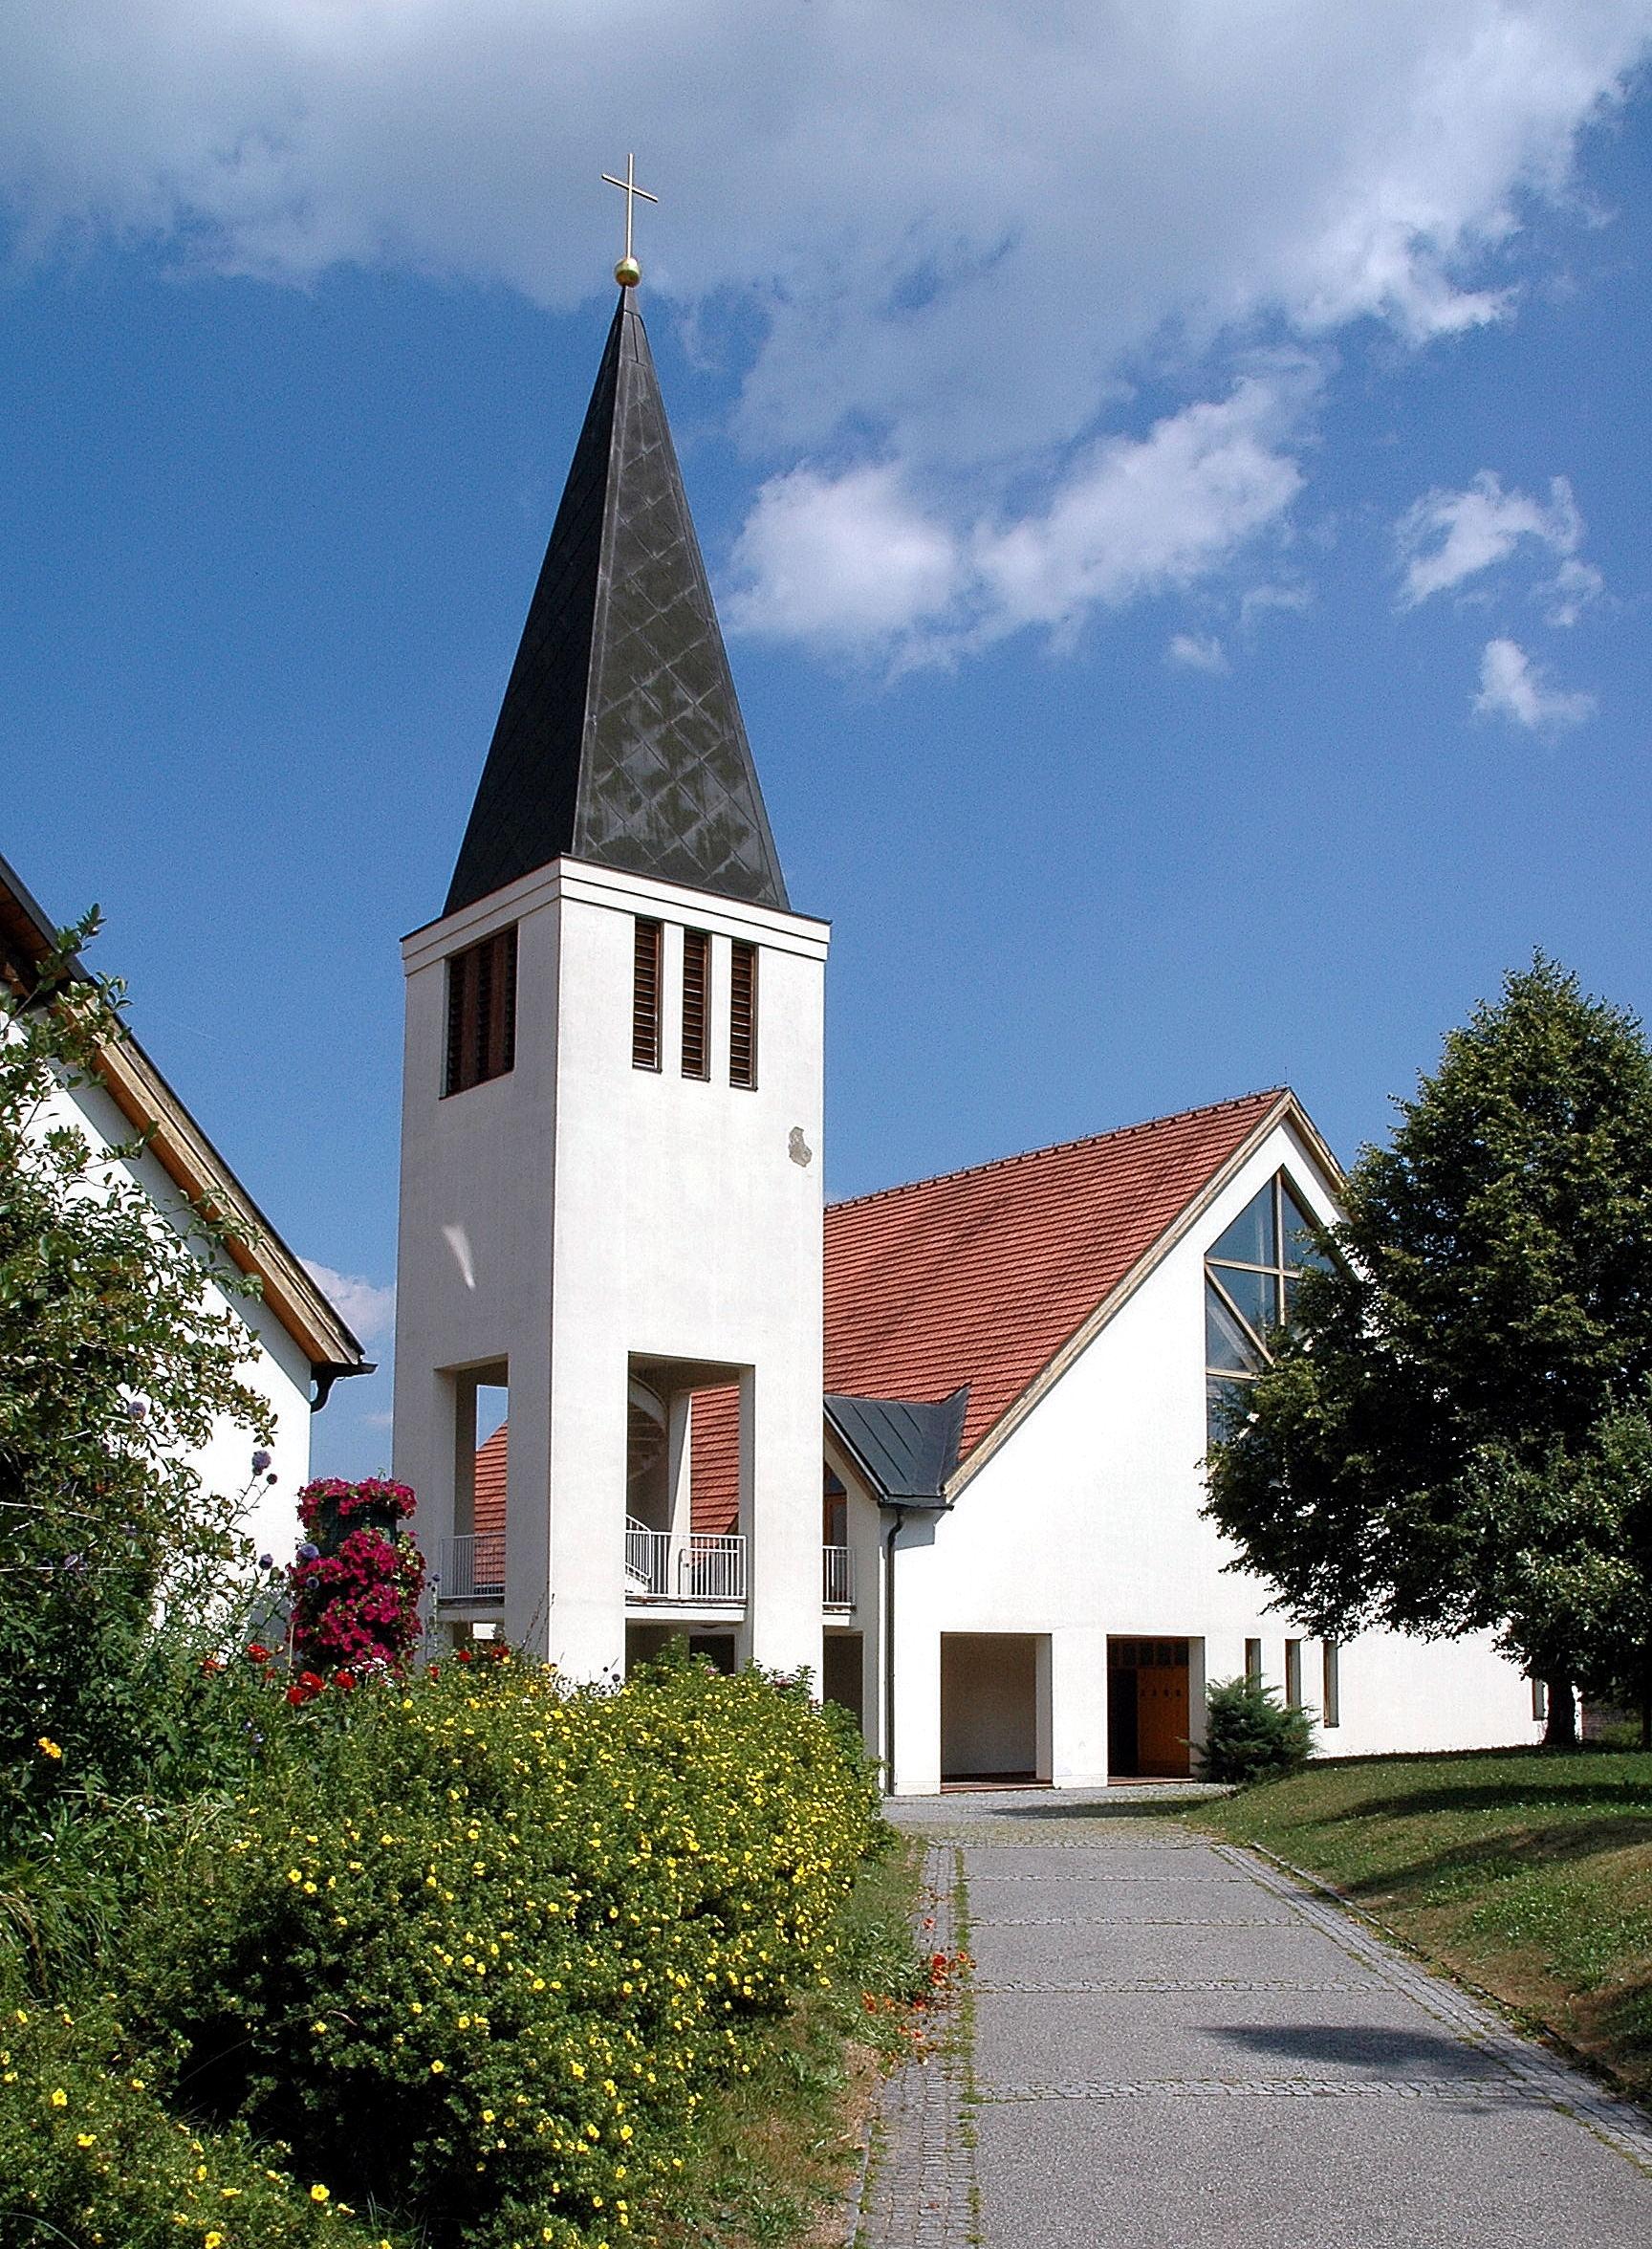 9061 Klagenfurt-Wlfnitz - blaklimos.com